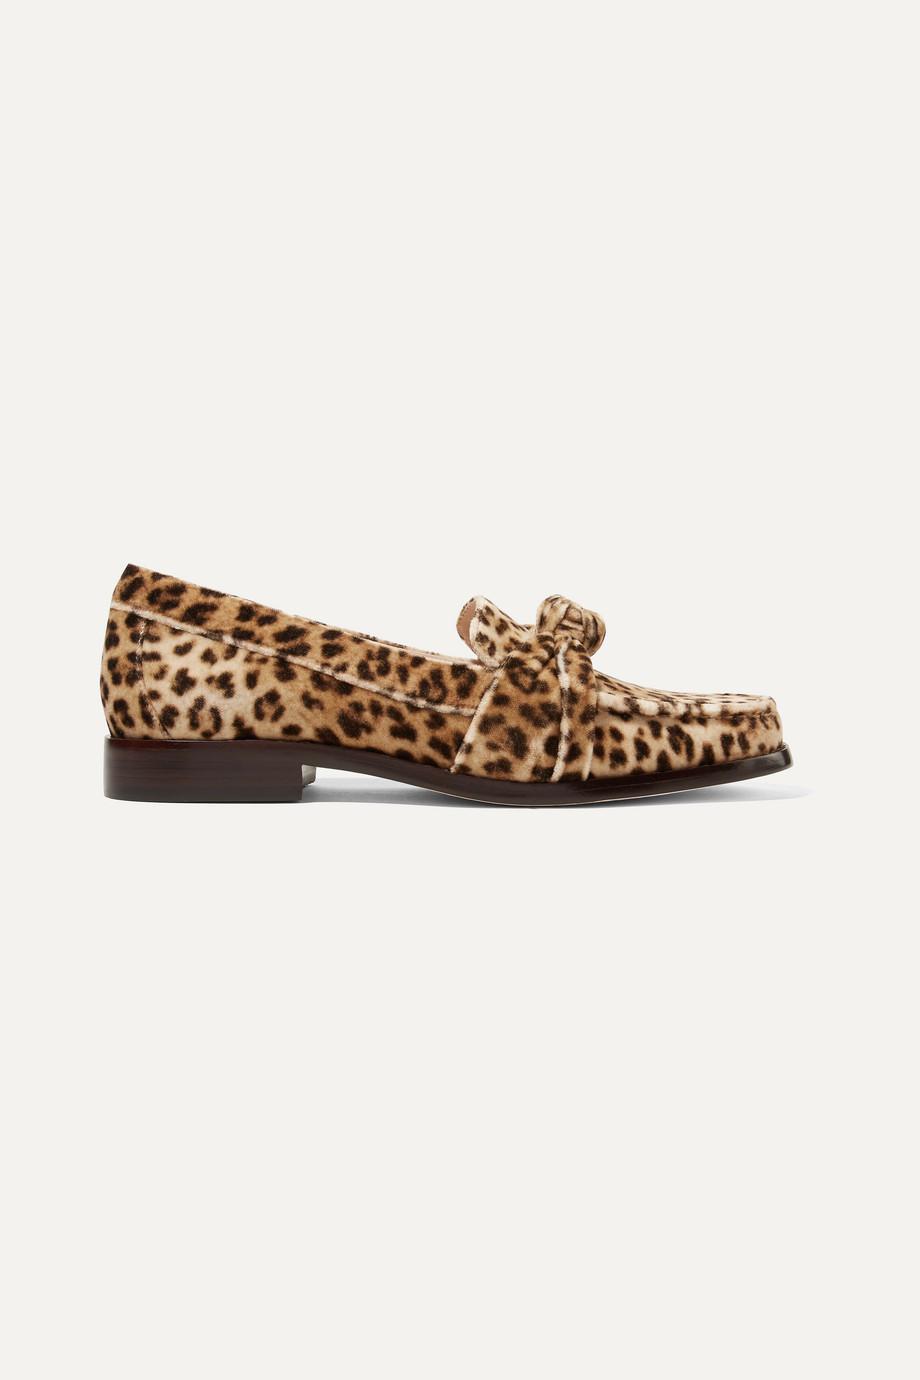 Loeffler Randall Elina knotted leopard-print velvet loafers